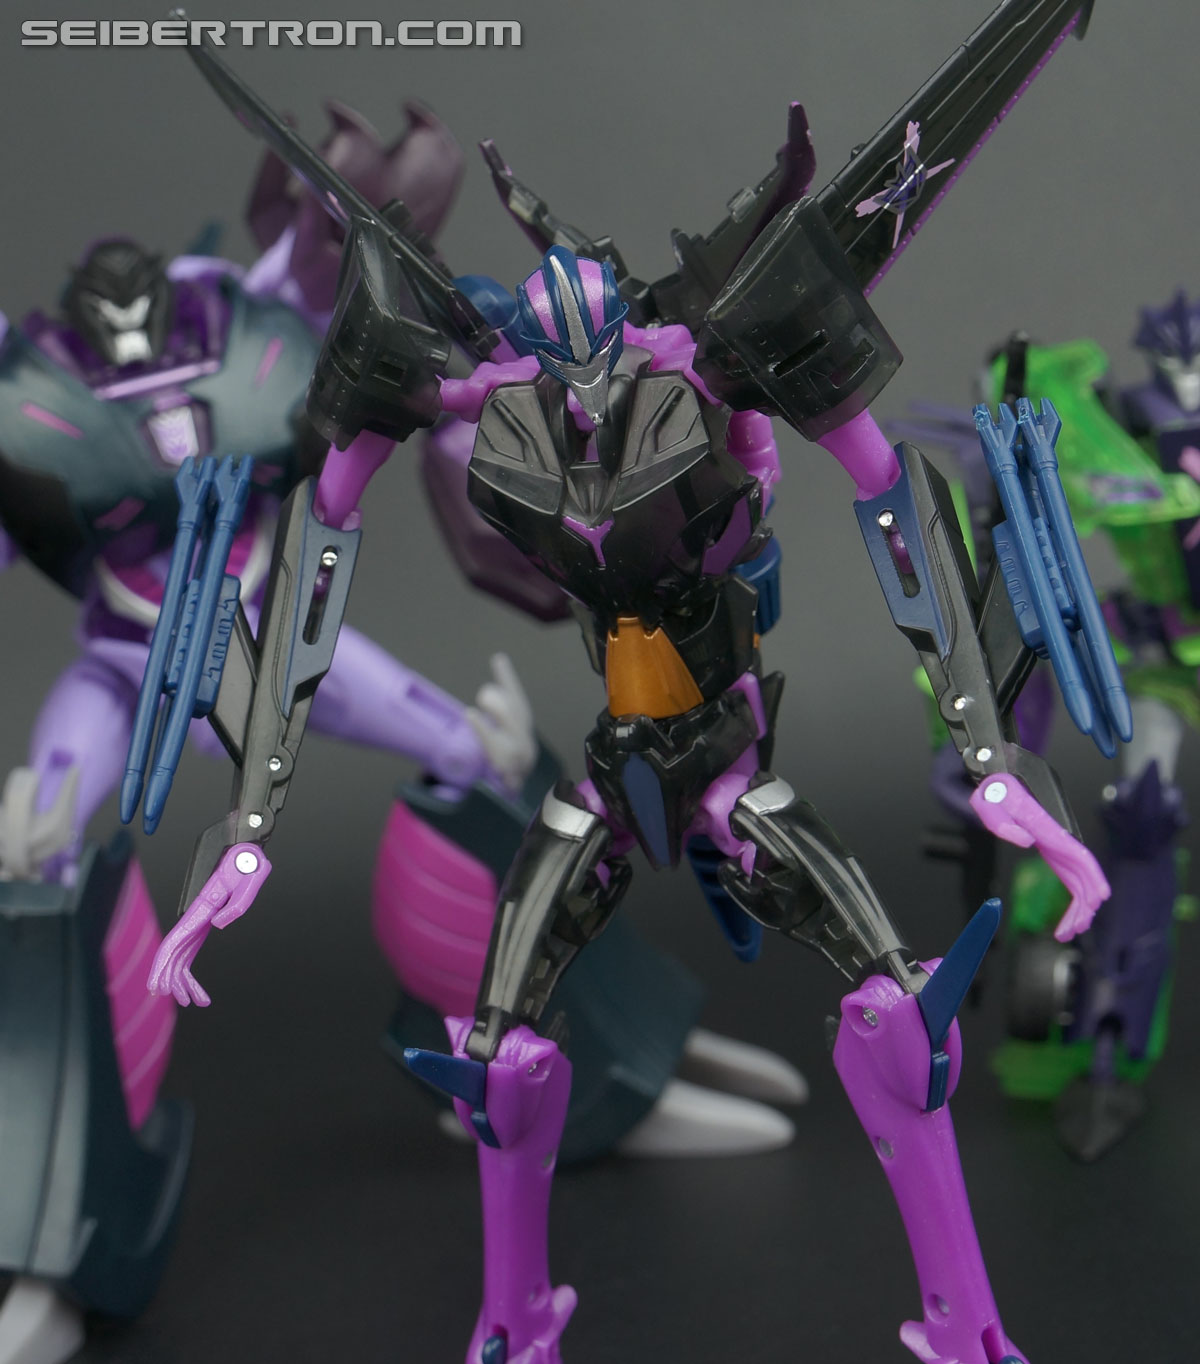 Transformers Prime: Robots In Disguise Dark Energon Starscream (Image #128 of 128)